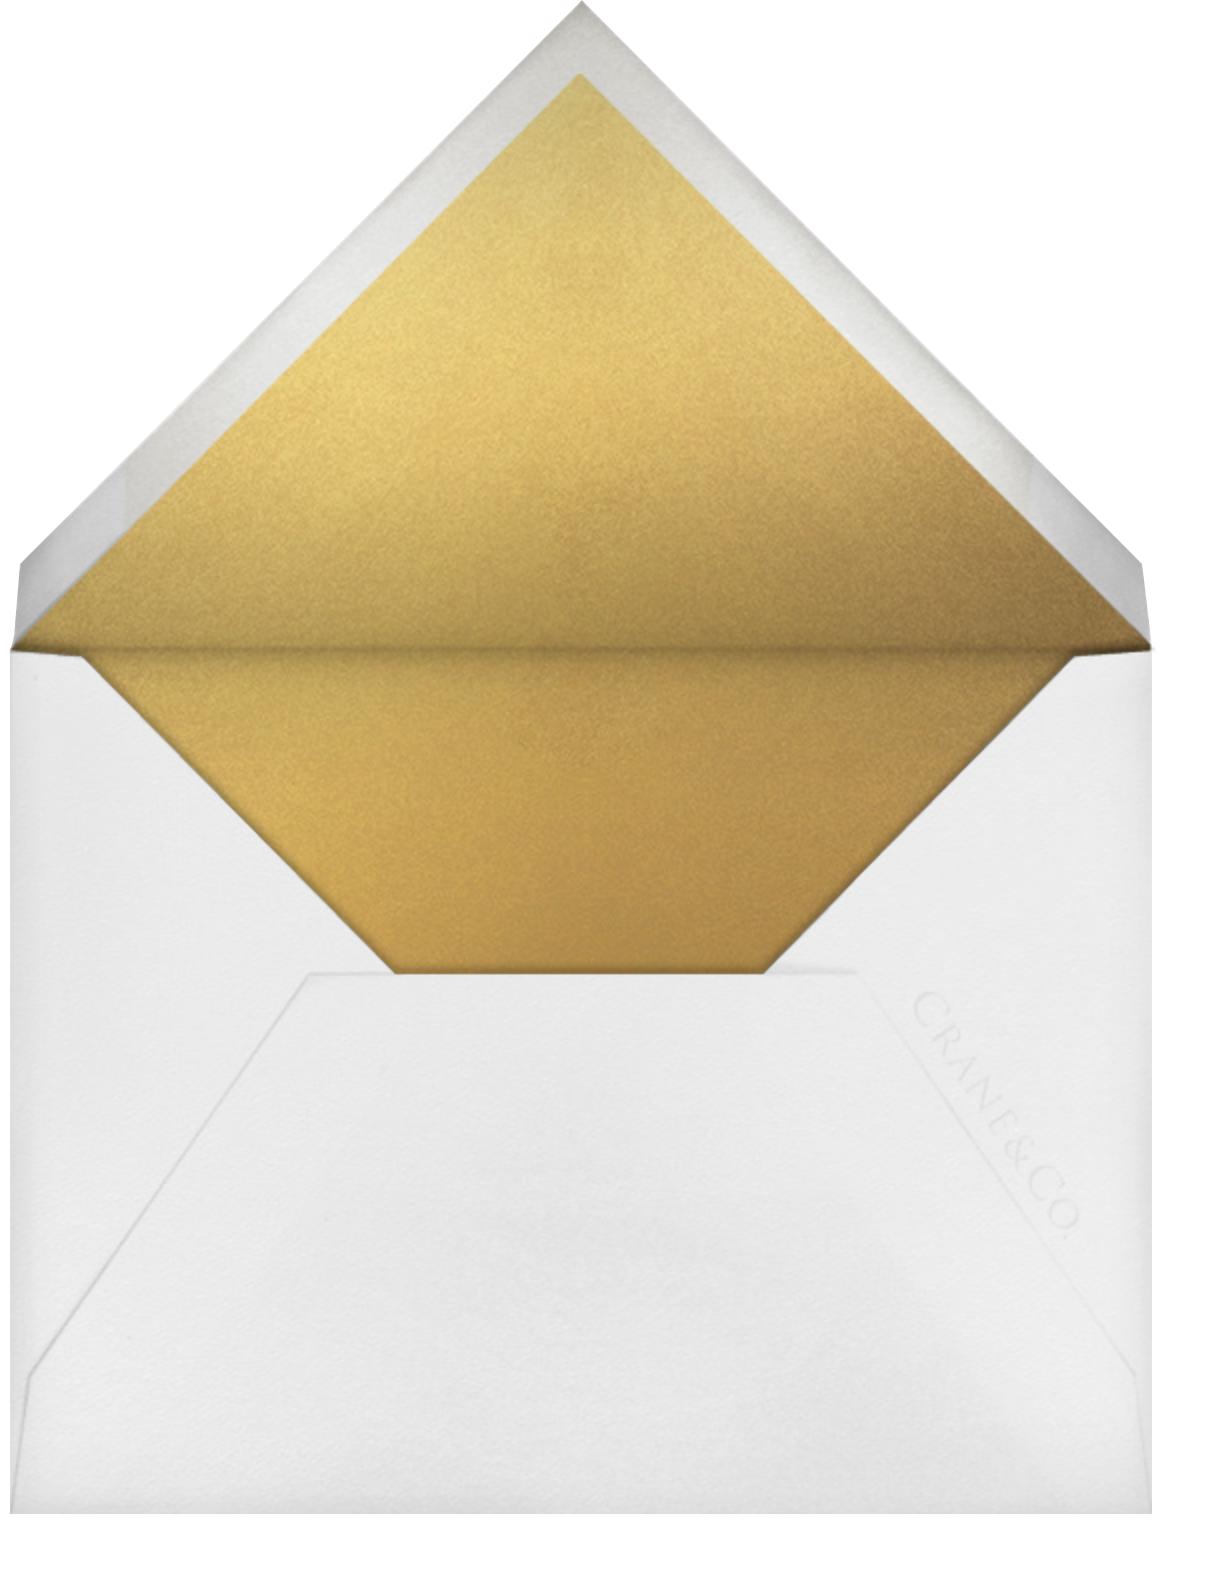 Oliver Park I (Invitation) - kate spade new york - All - envelope back